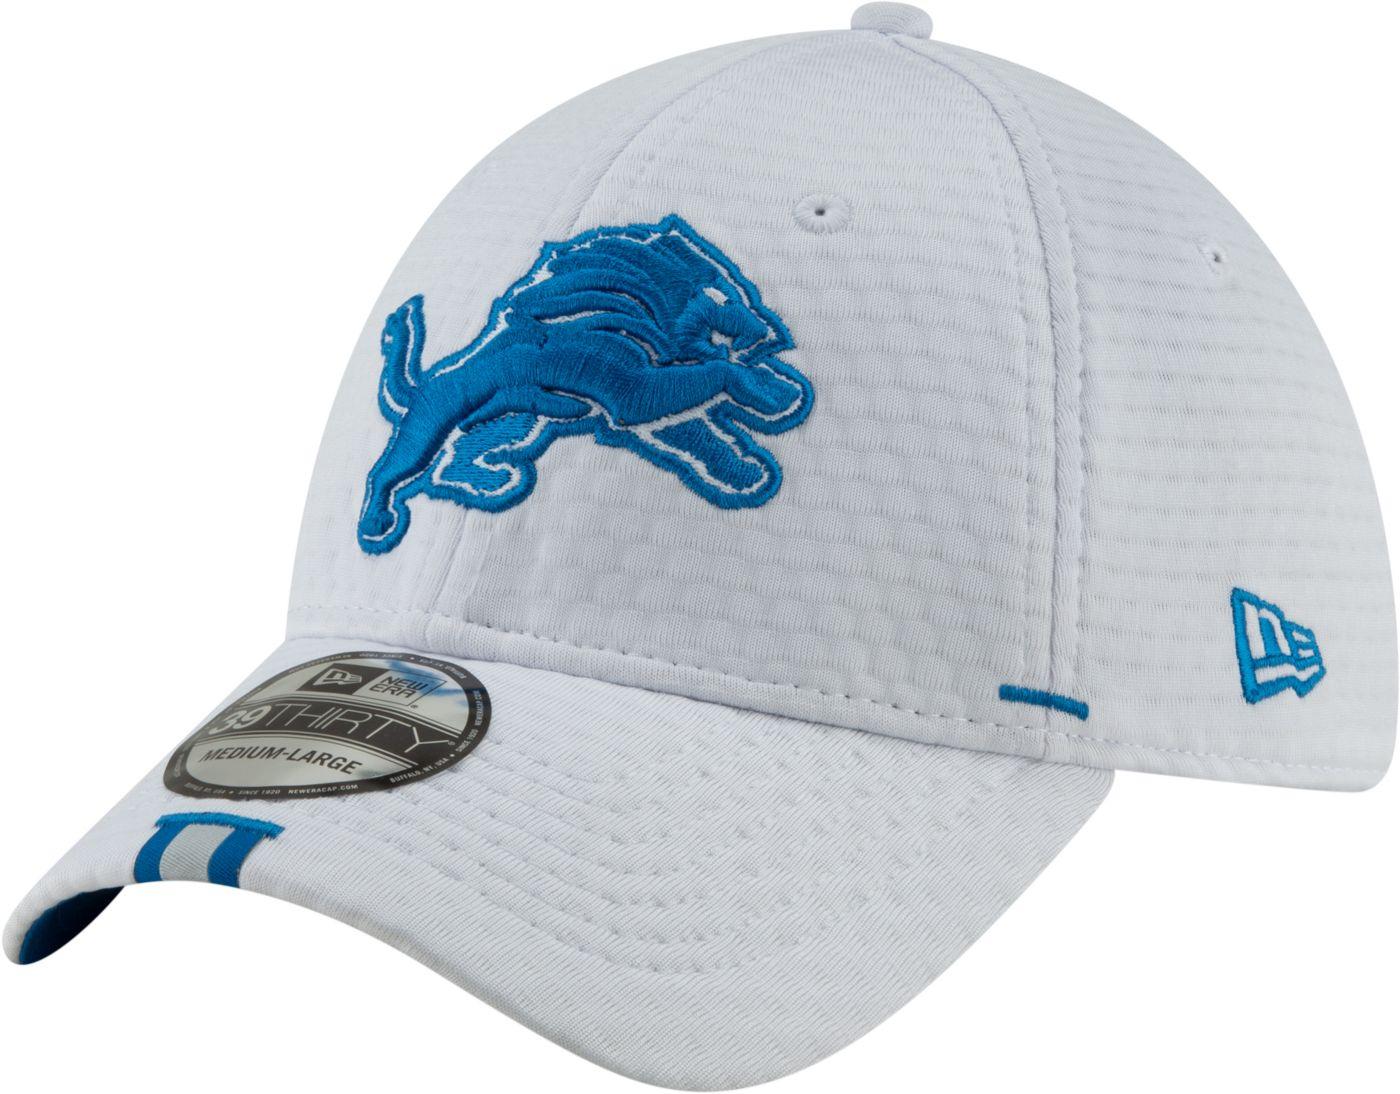 New Era Men's Detroit Lions Sideline Training Camp 39Thirty Stretch Fit White Hat